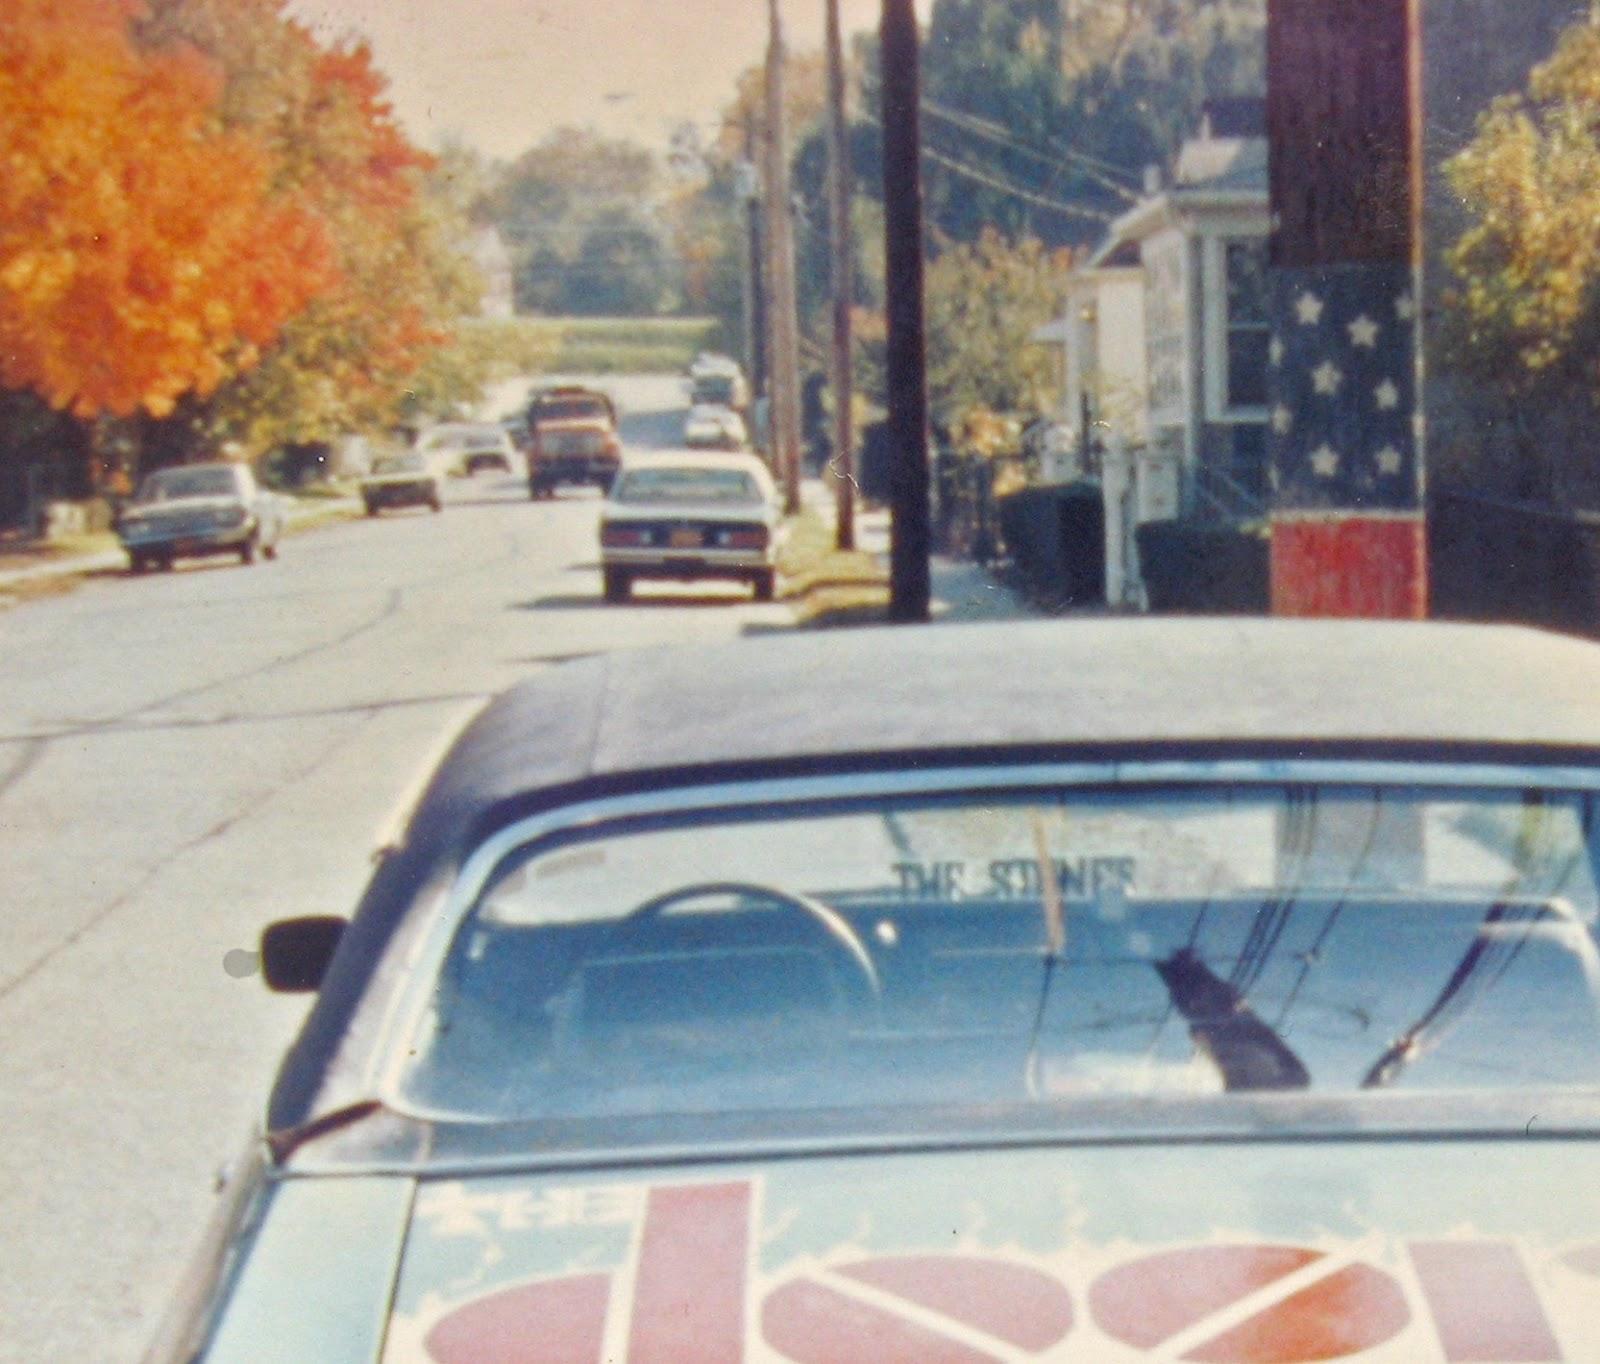 Simonson Ave & a piece of the Doorsmobile